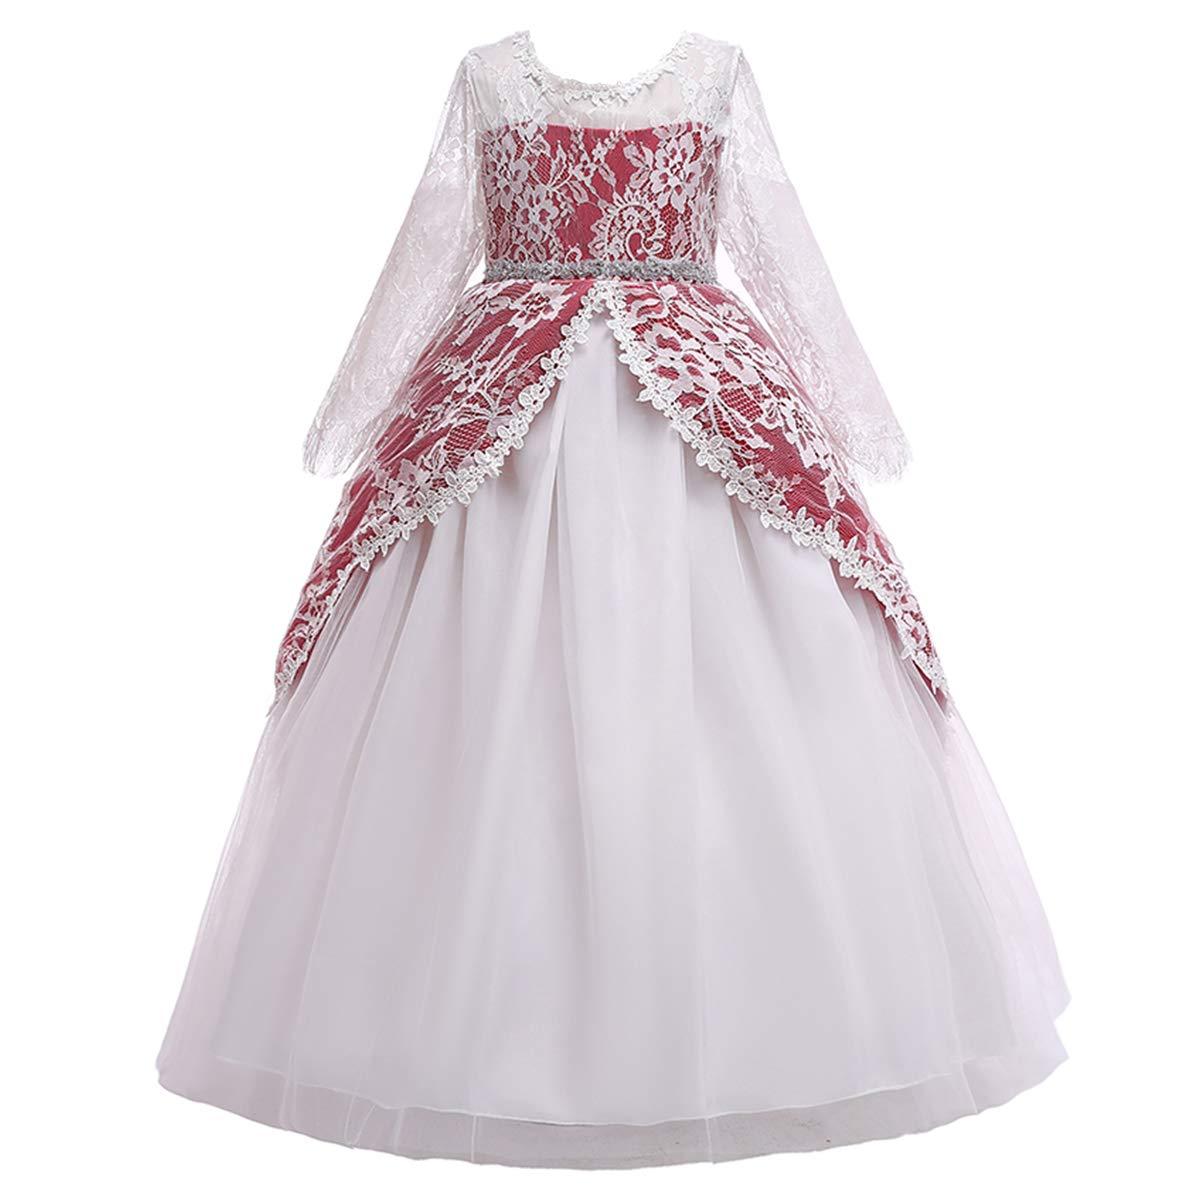 2d2da7dfb Amazon.com  Girls Long Sleeve Royal Palace Lace Dance Princess ...